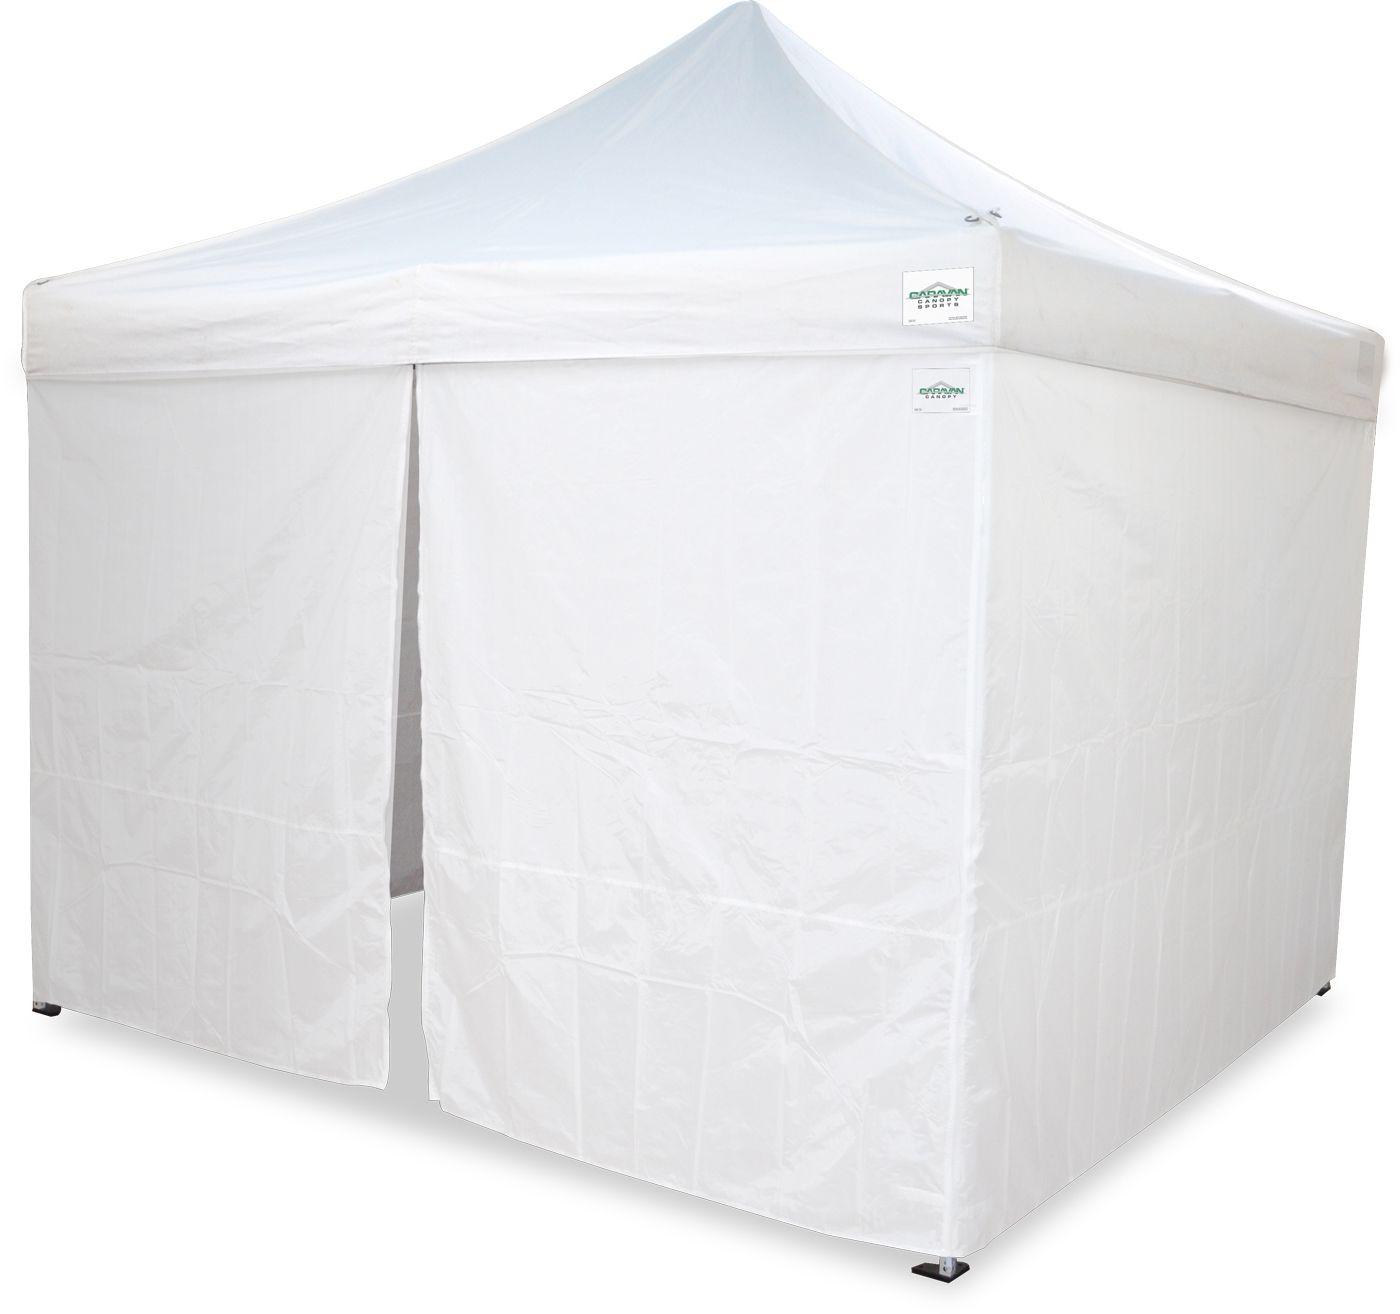 1  sc 1 st  DICKu0027S Sporting Goods & Caravan Canopy 10u0027 x 10u0027 Commercial Grade Canopy Sidewalls | DICKu0027S ...